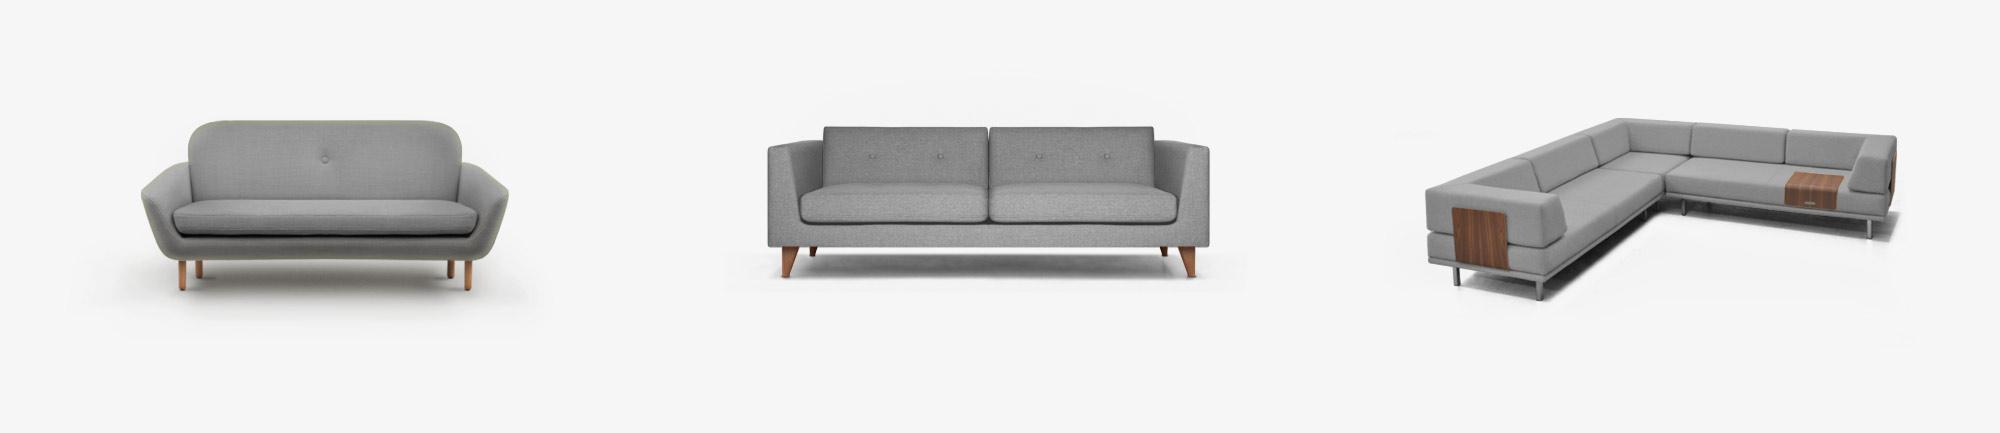 Sig-sofas.jpg